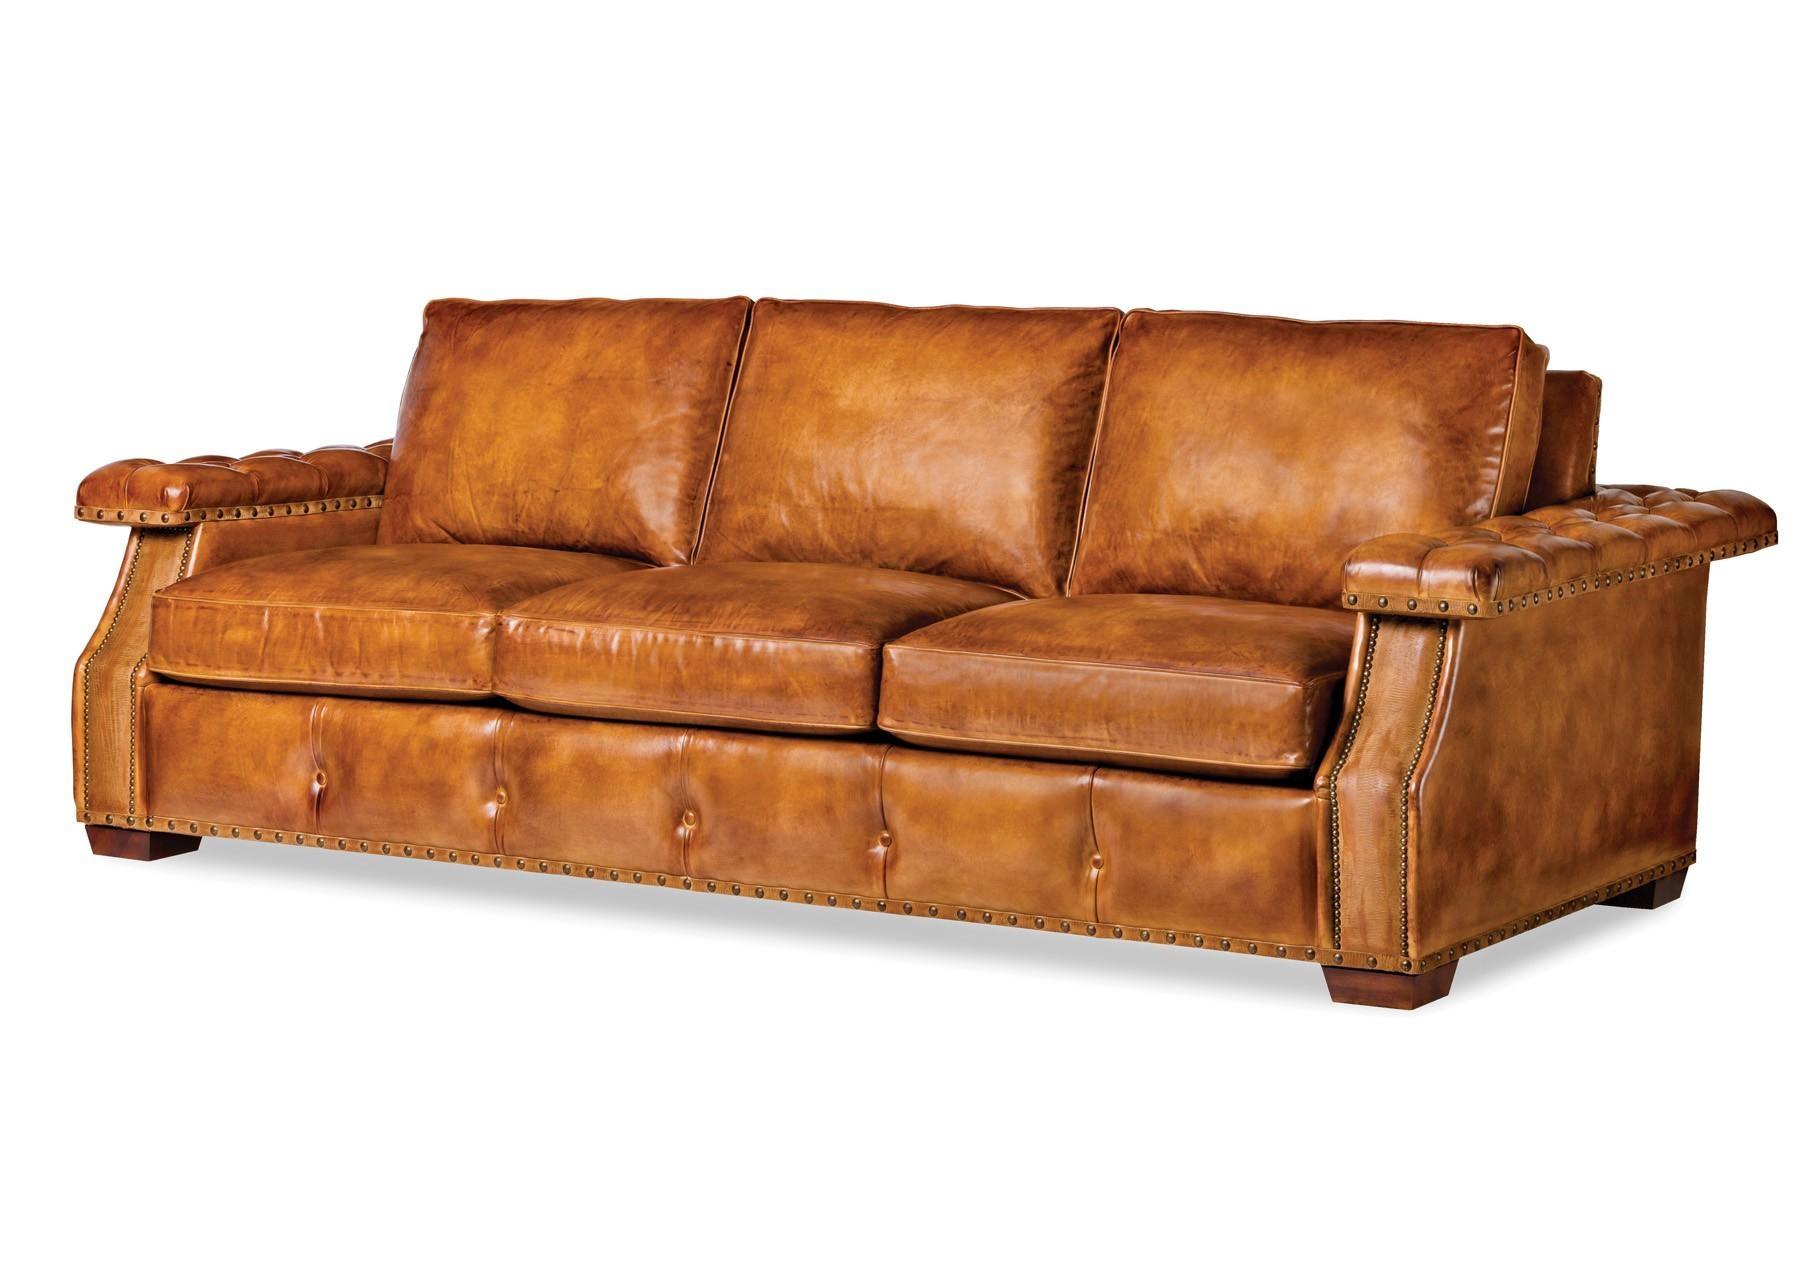 camel colored leather sofa considering caramel leather. Black Bedroom Furniture Sets. Home Design Ideas